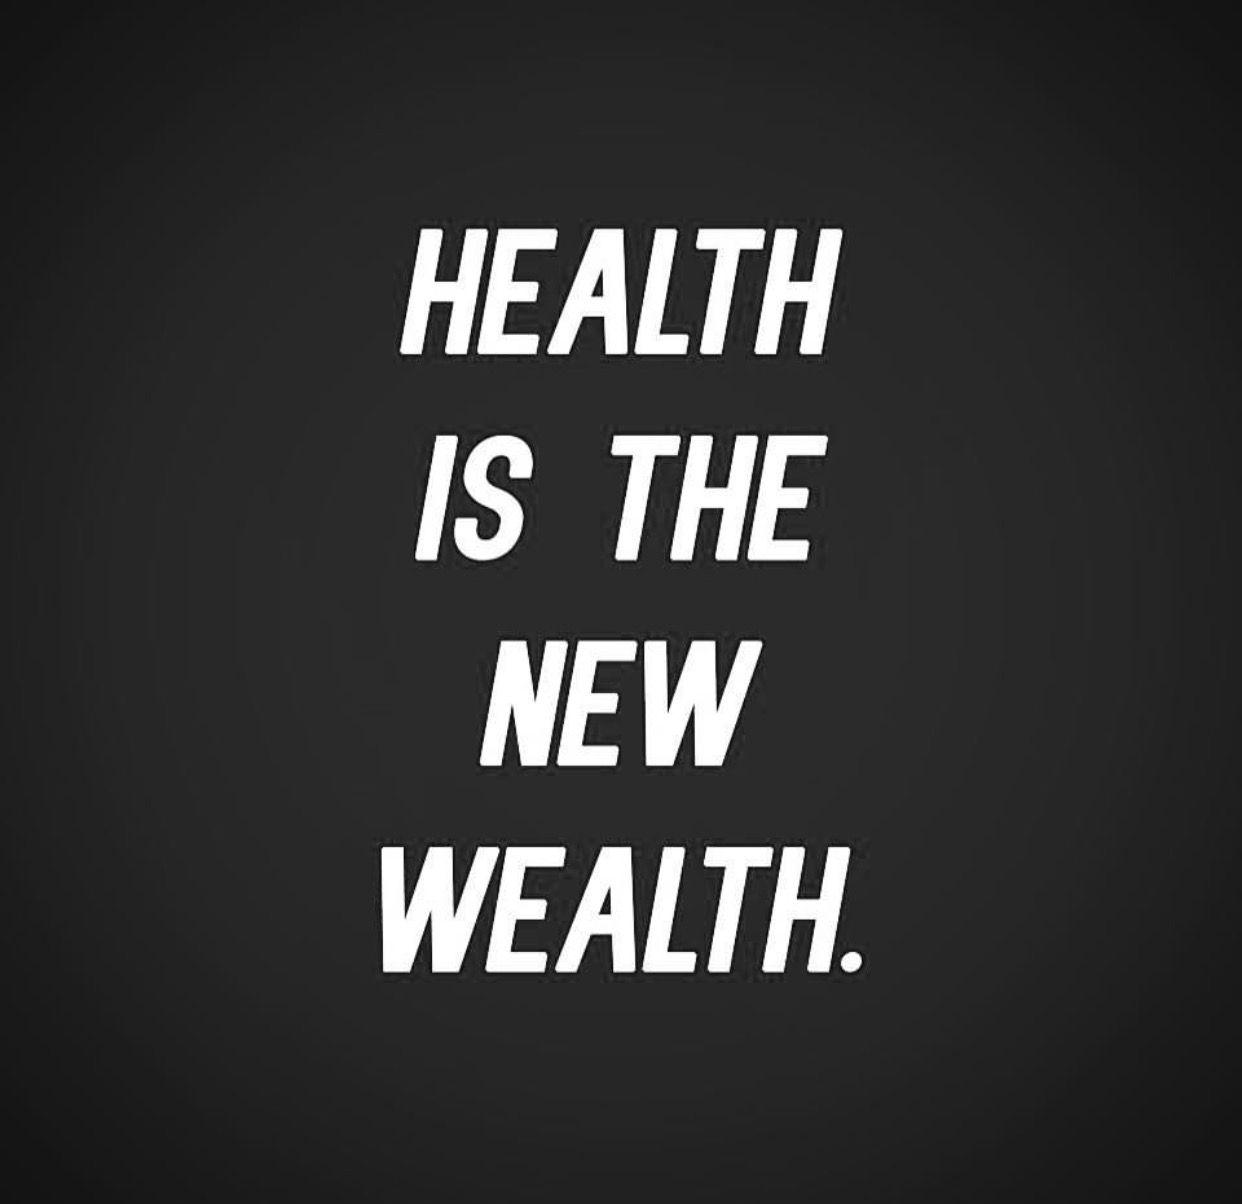 Health health is wealth quotes health quotes health